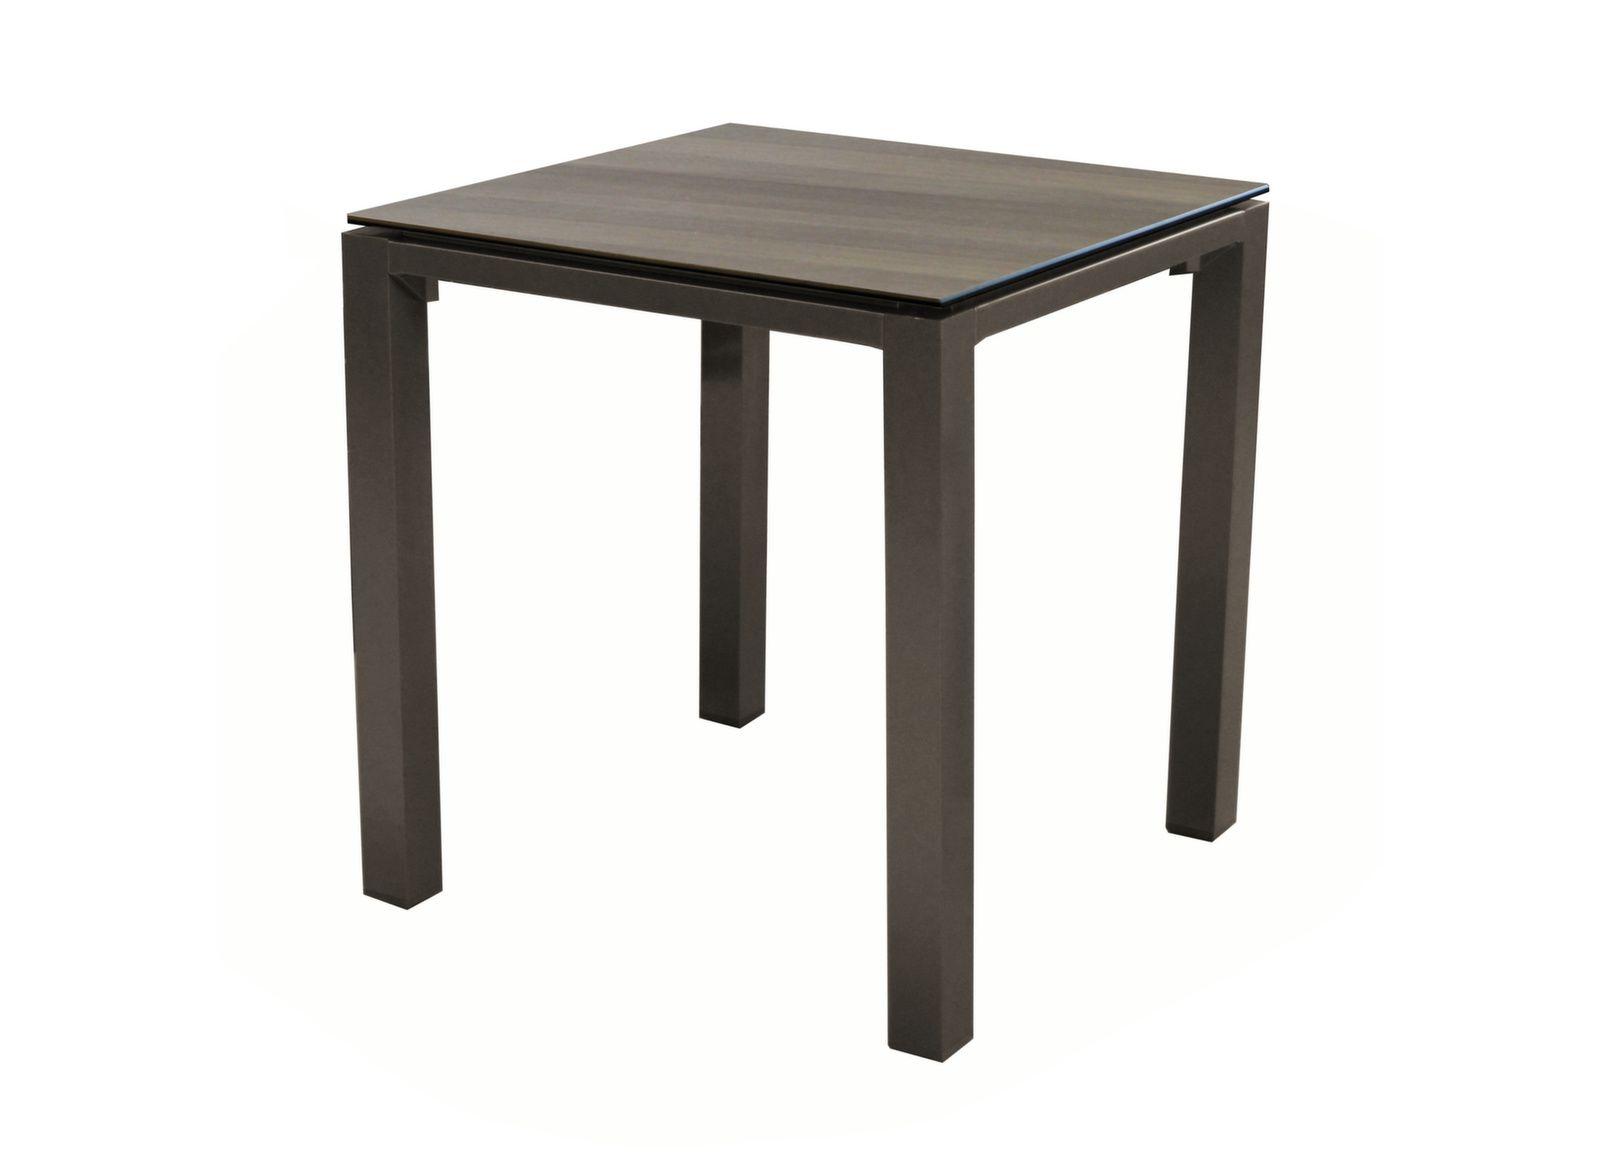 Table Stonéo 90 cm plateau Trespa®